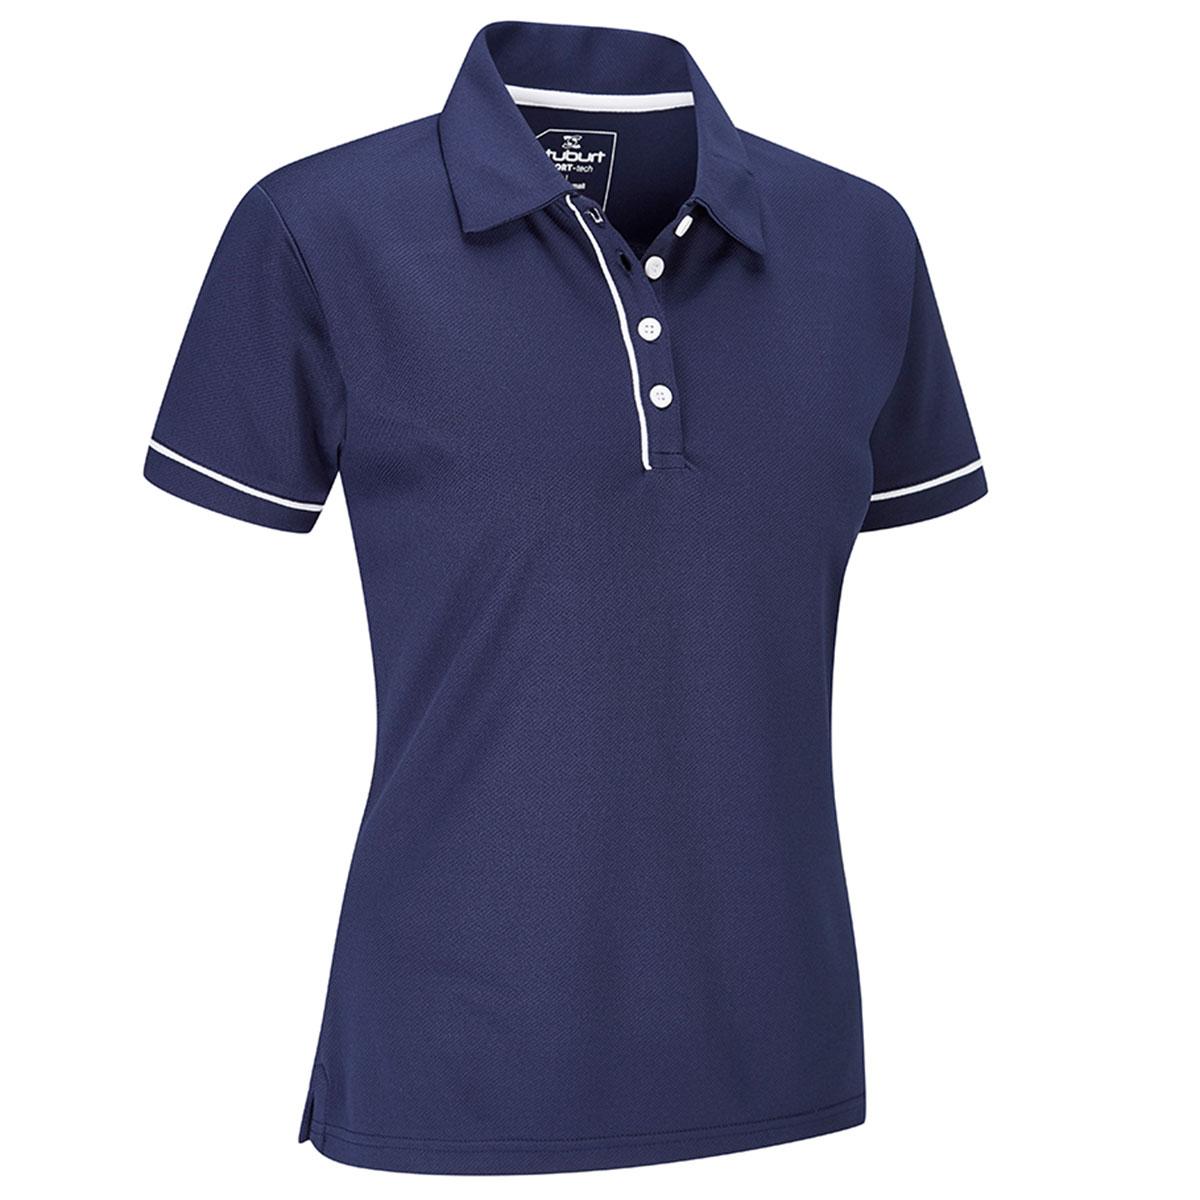 c4e38fec Stuburt Sport-Tech Ladies Polo Shirt from american golf